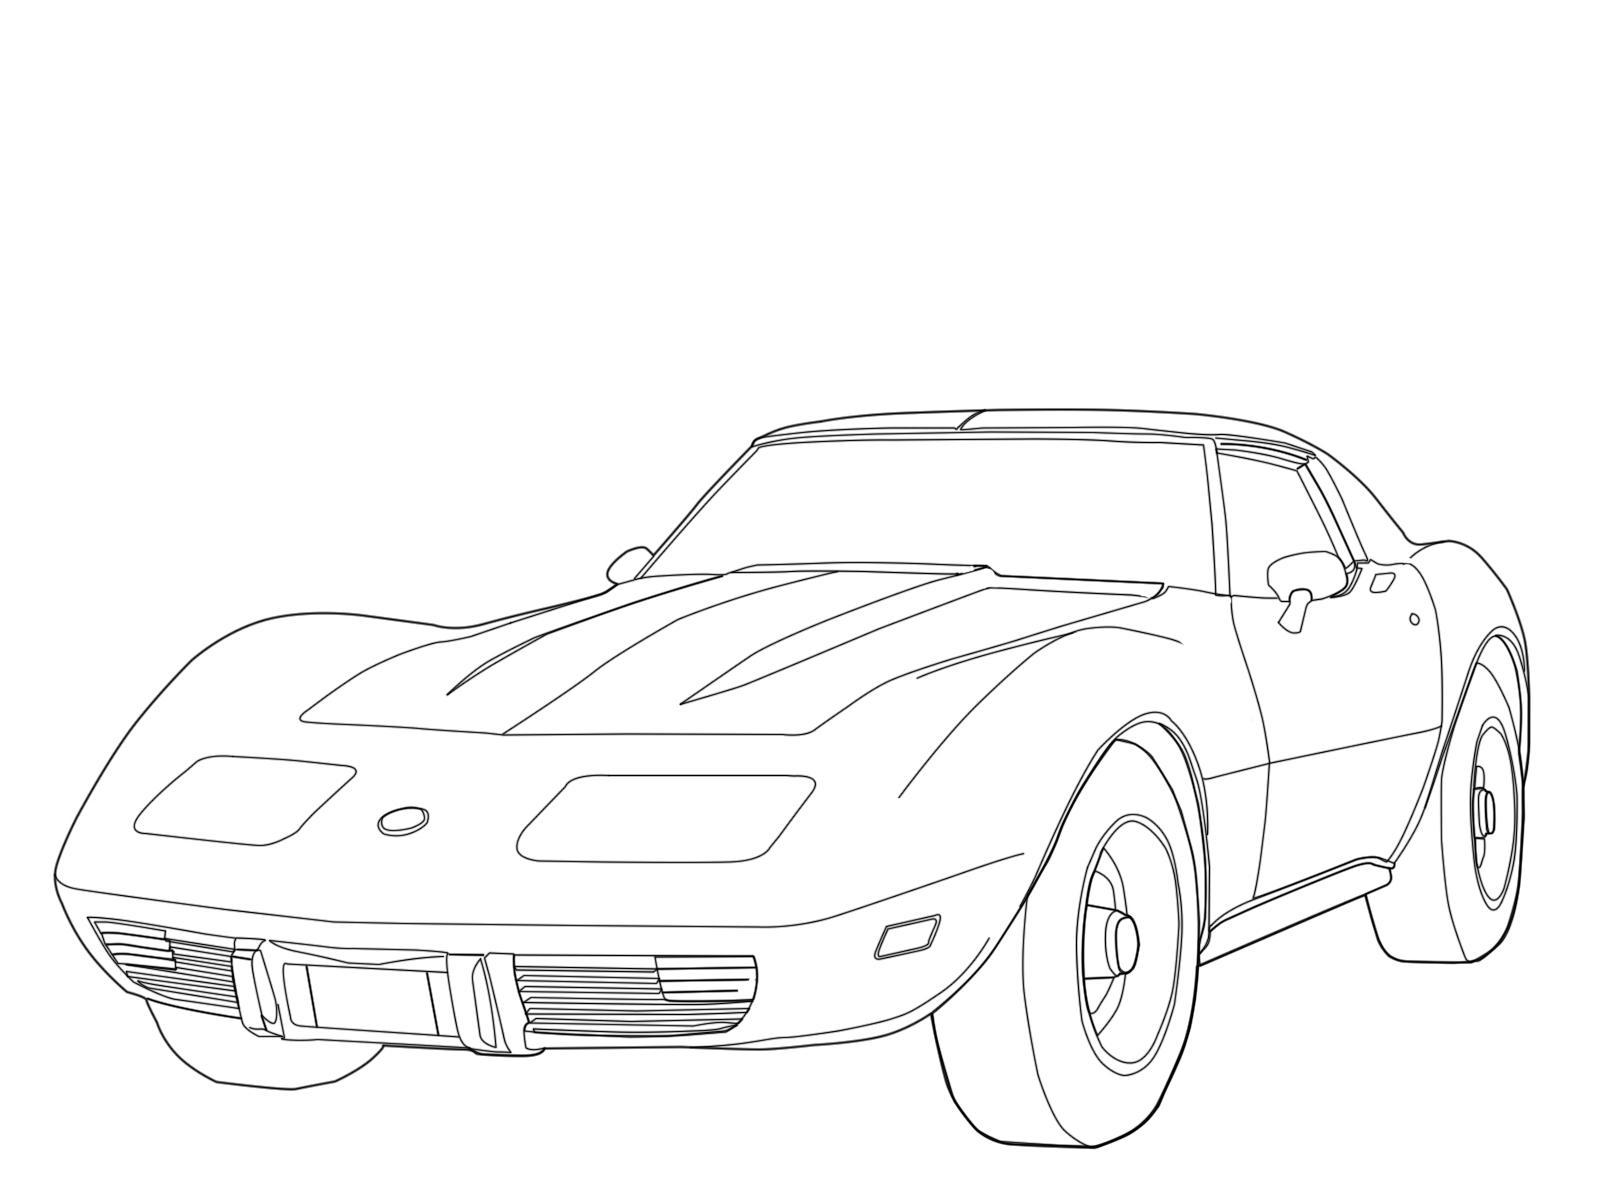 Corvette Line Drawing_C%7CggVq0luotvixNwfGD0jS2inWDCnXHtIlrHEFNV6qw on 1996 Chevrolet Cars